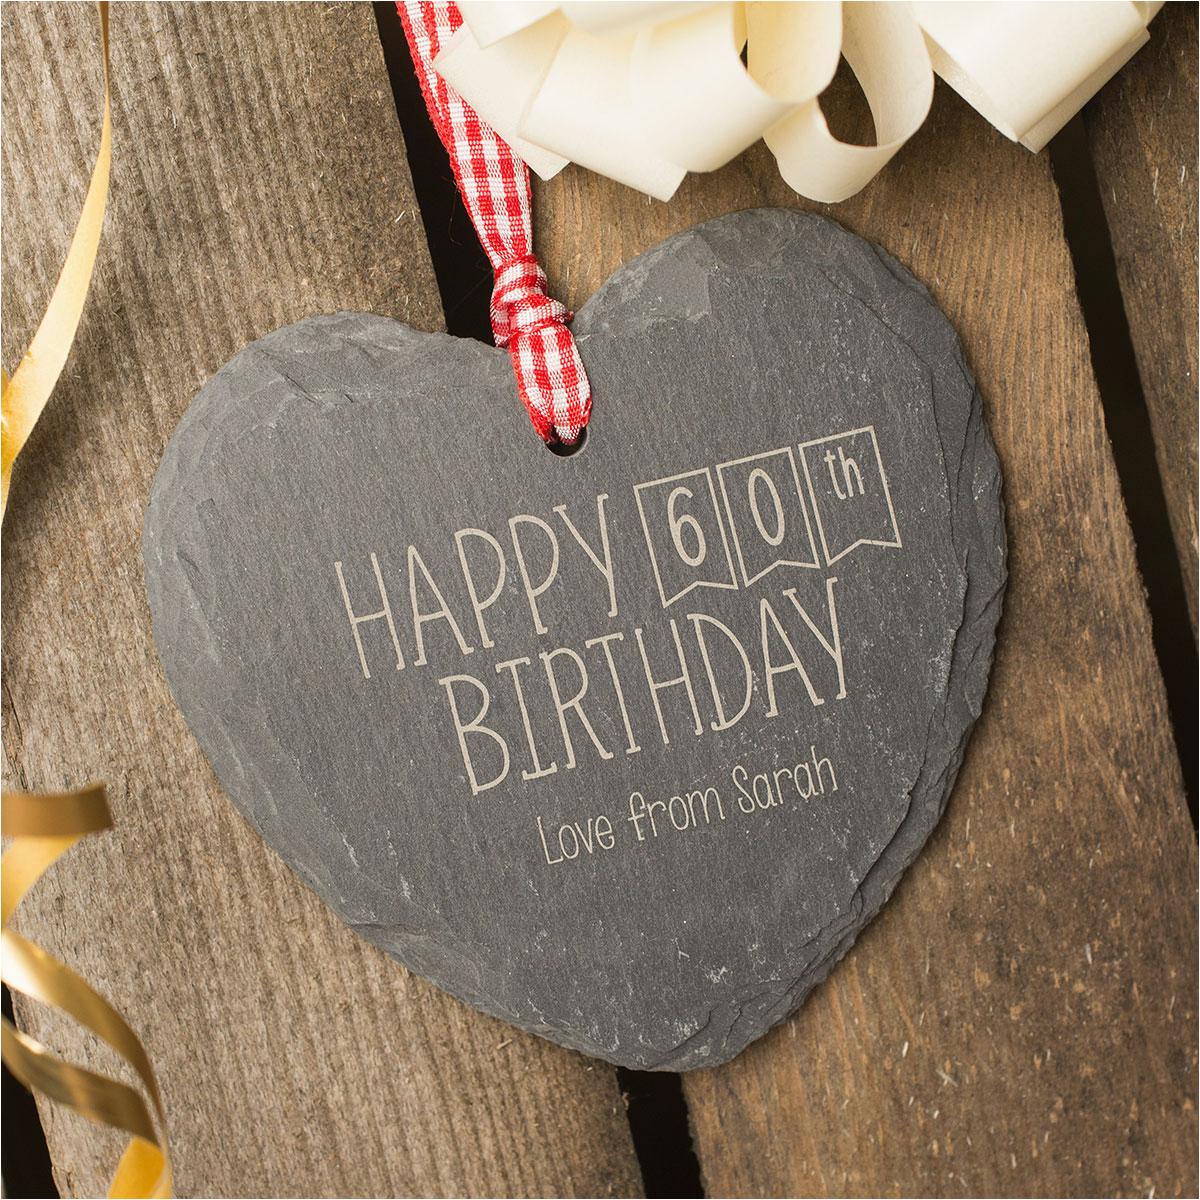 60th birthday gift ideas for mum uk